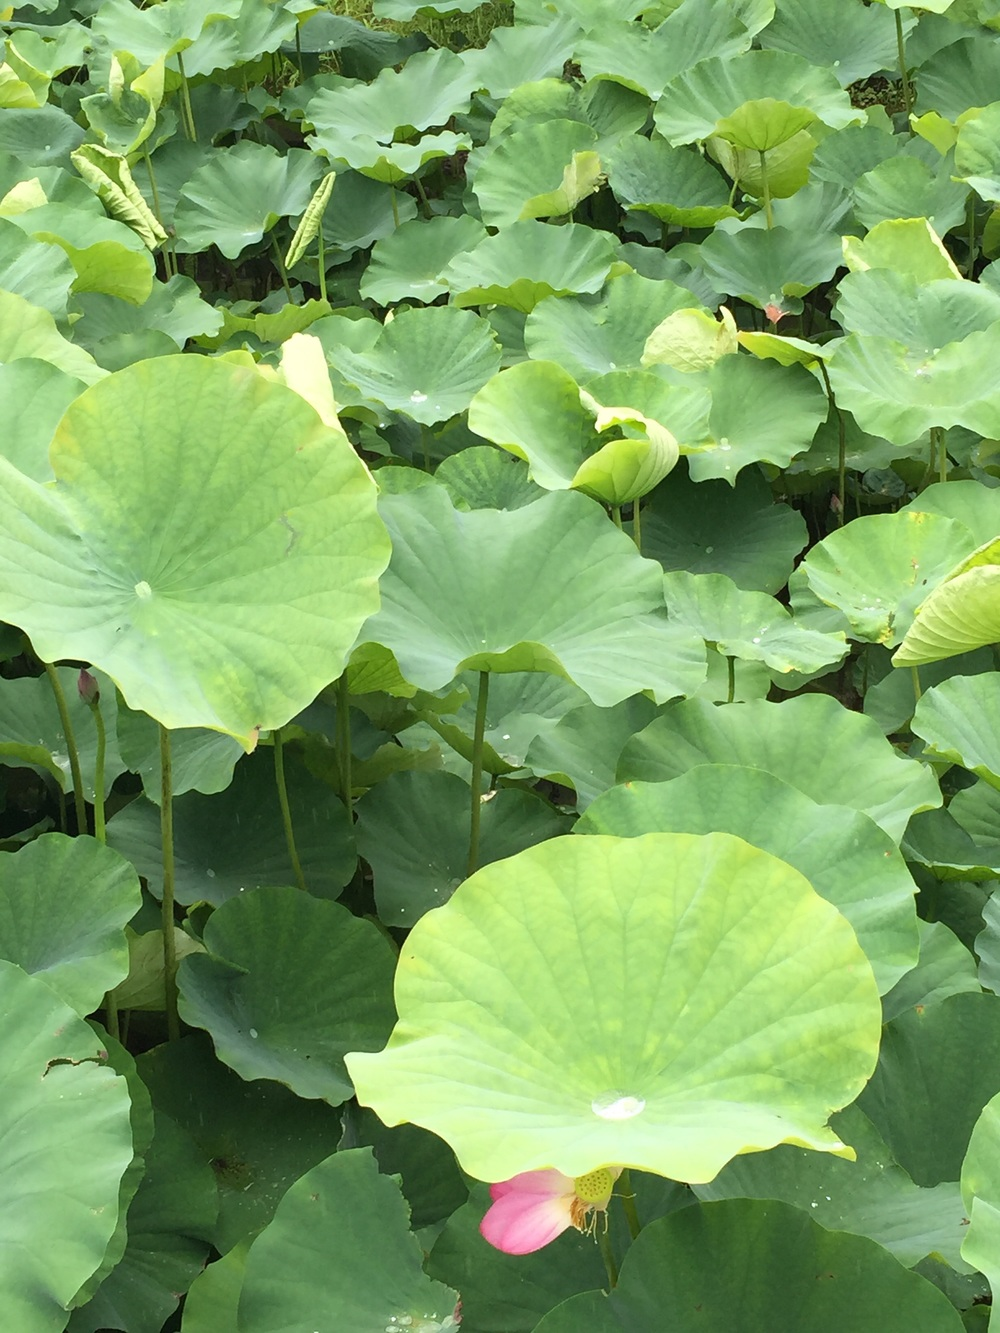 Lotus pond at Toji.